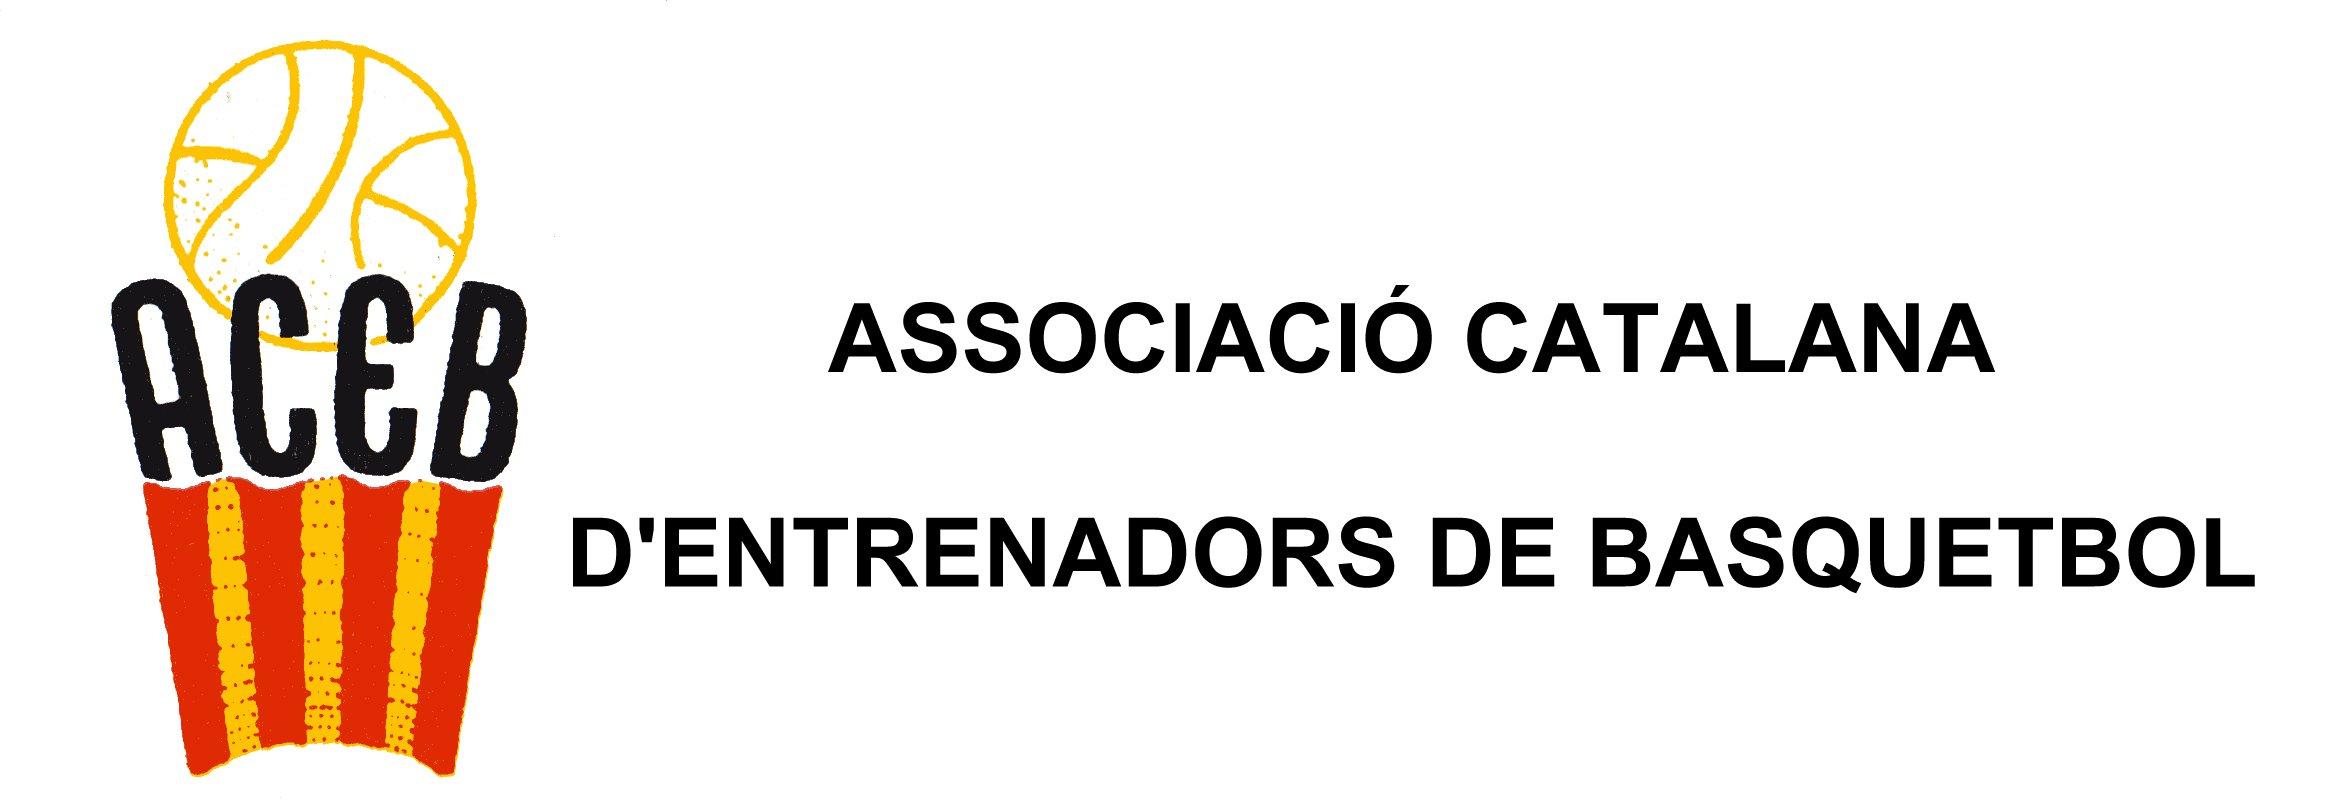 Clínic ACEB - 33è Torneig BBVA (Sant Julià de Vilatorta)